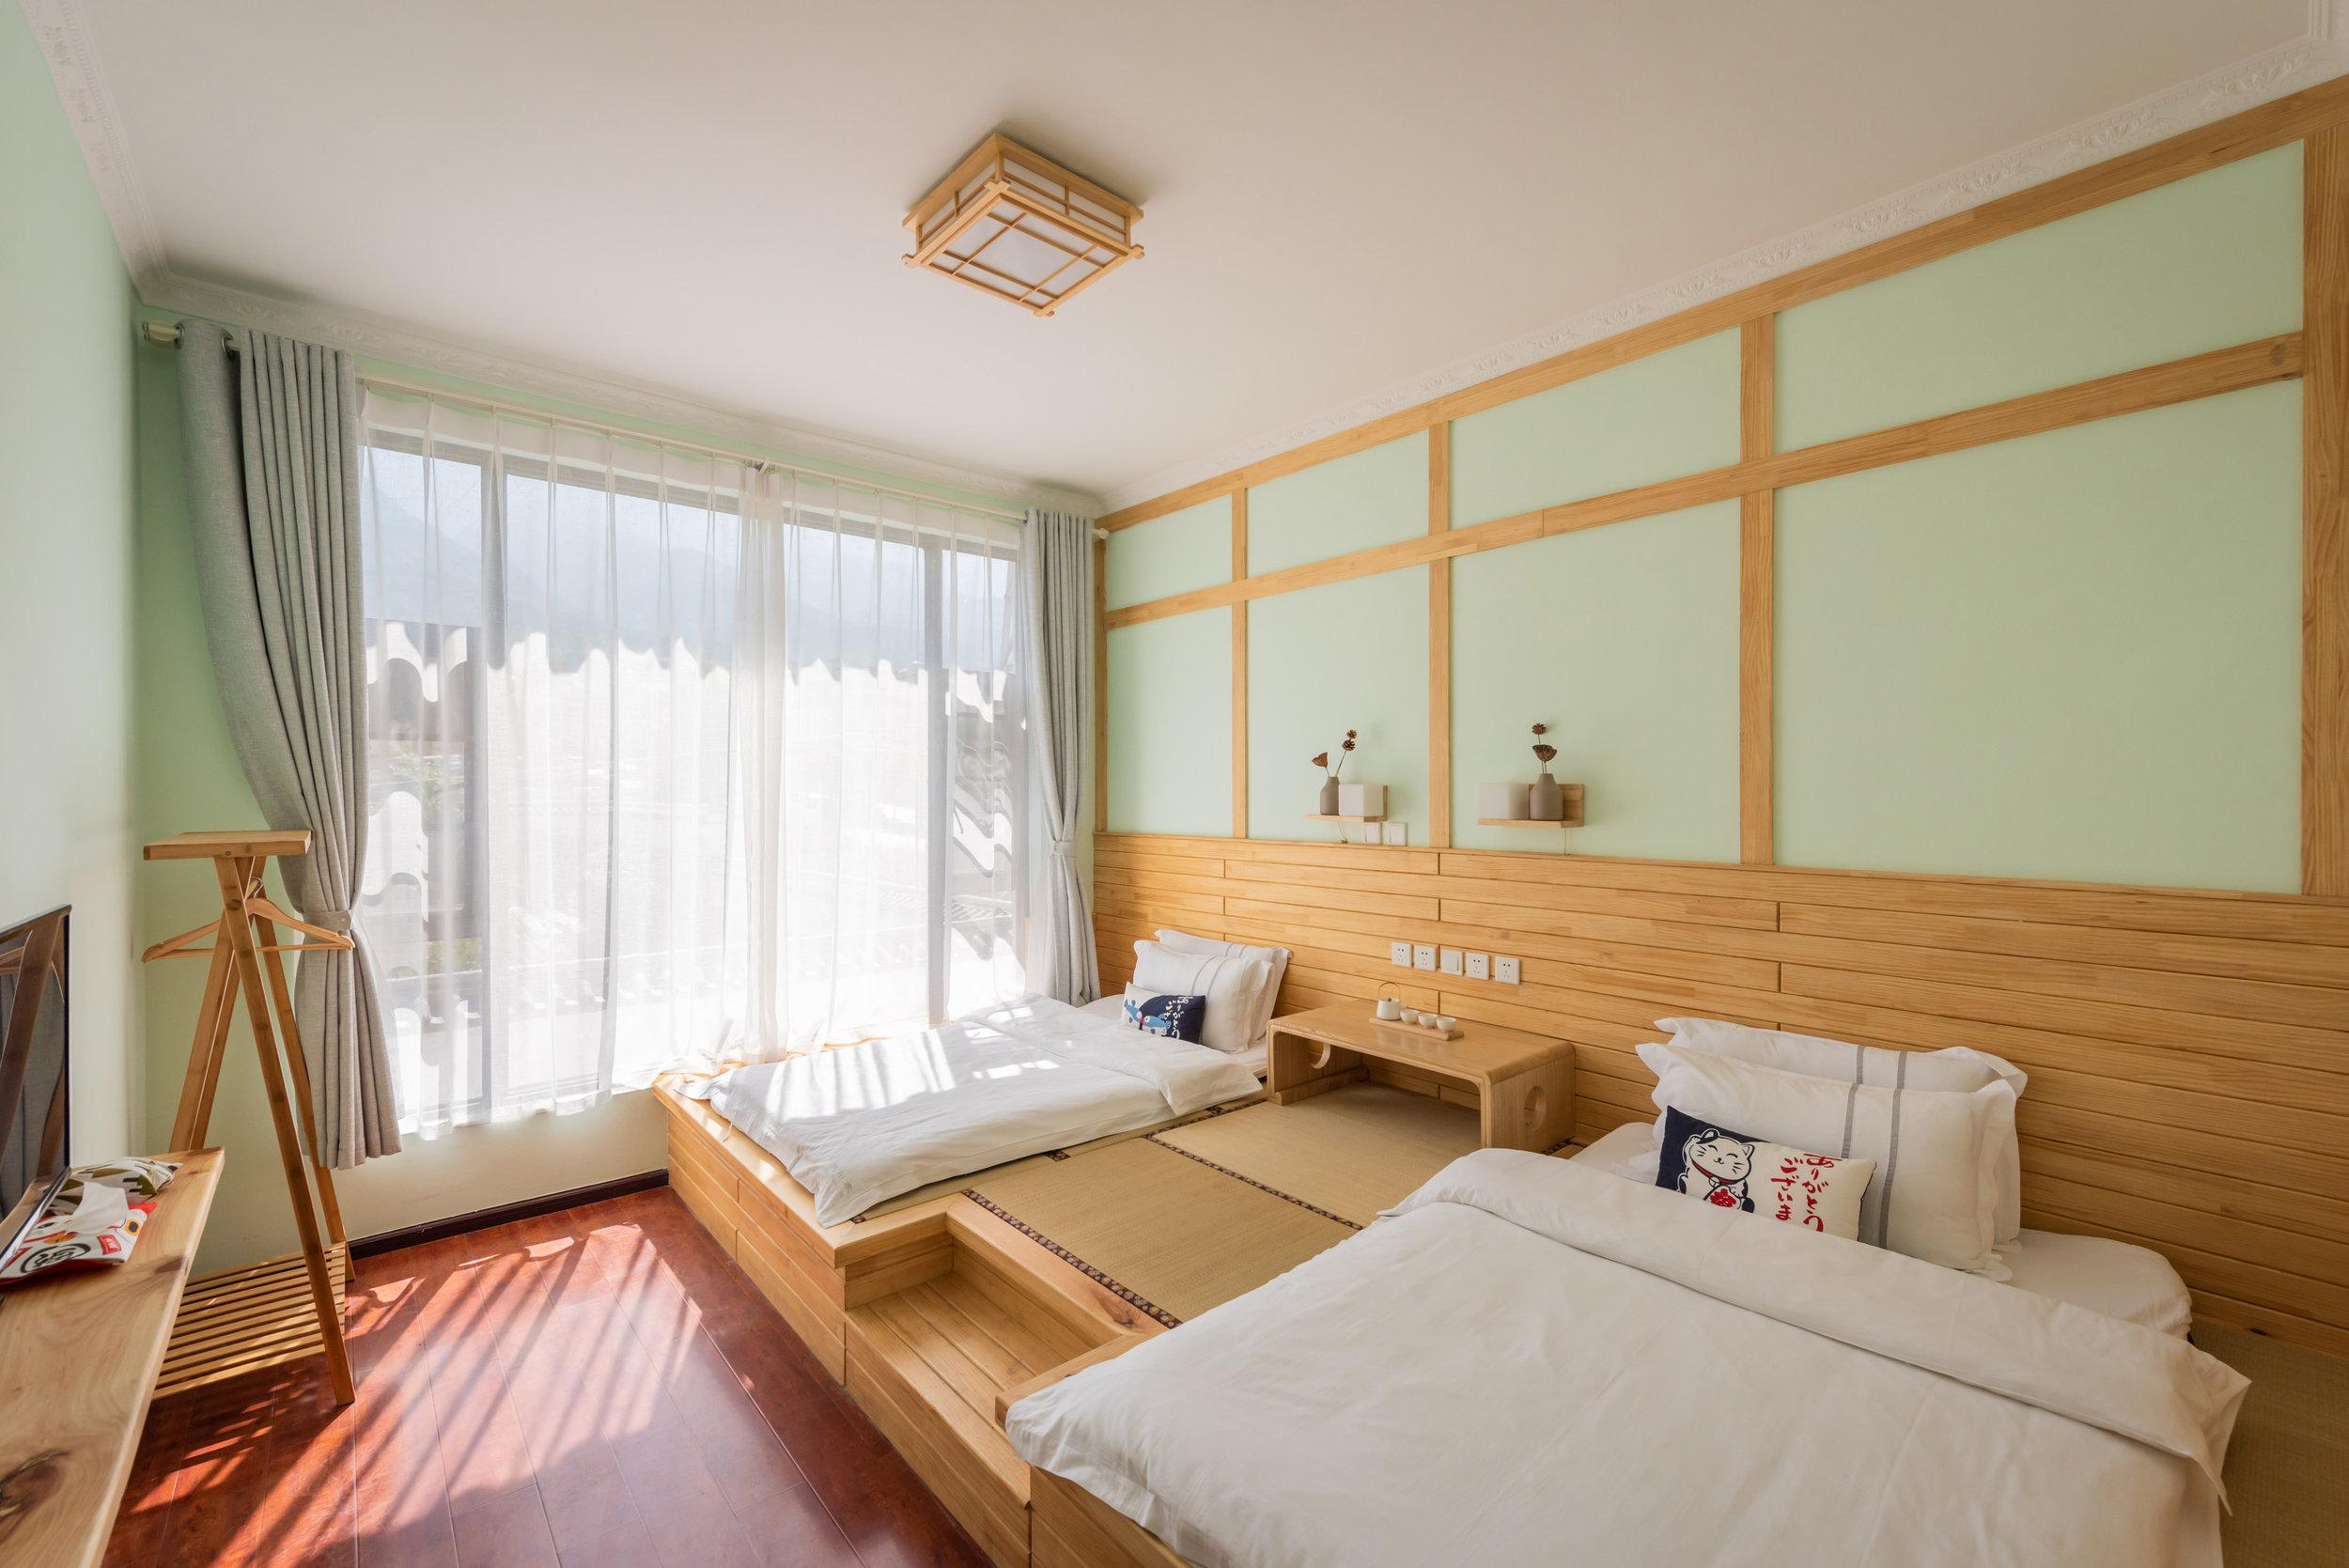 Guest Room 2@ Akitaya Guesthouse Dali 大理秋田家精品客栈